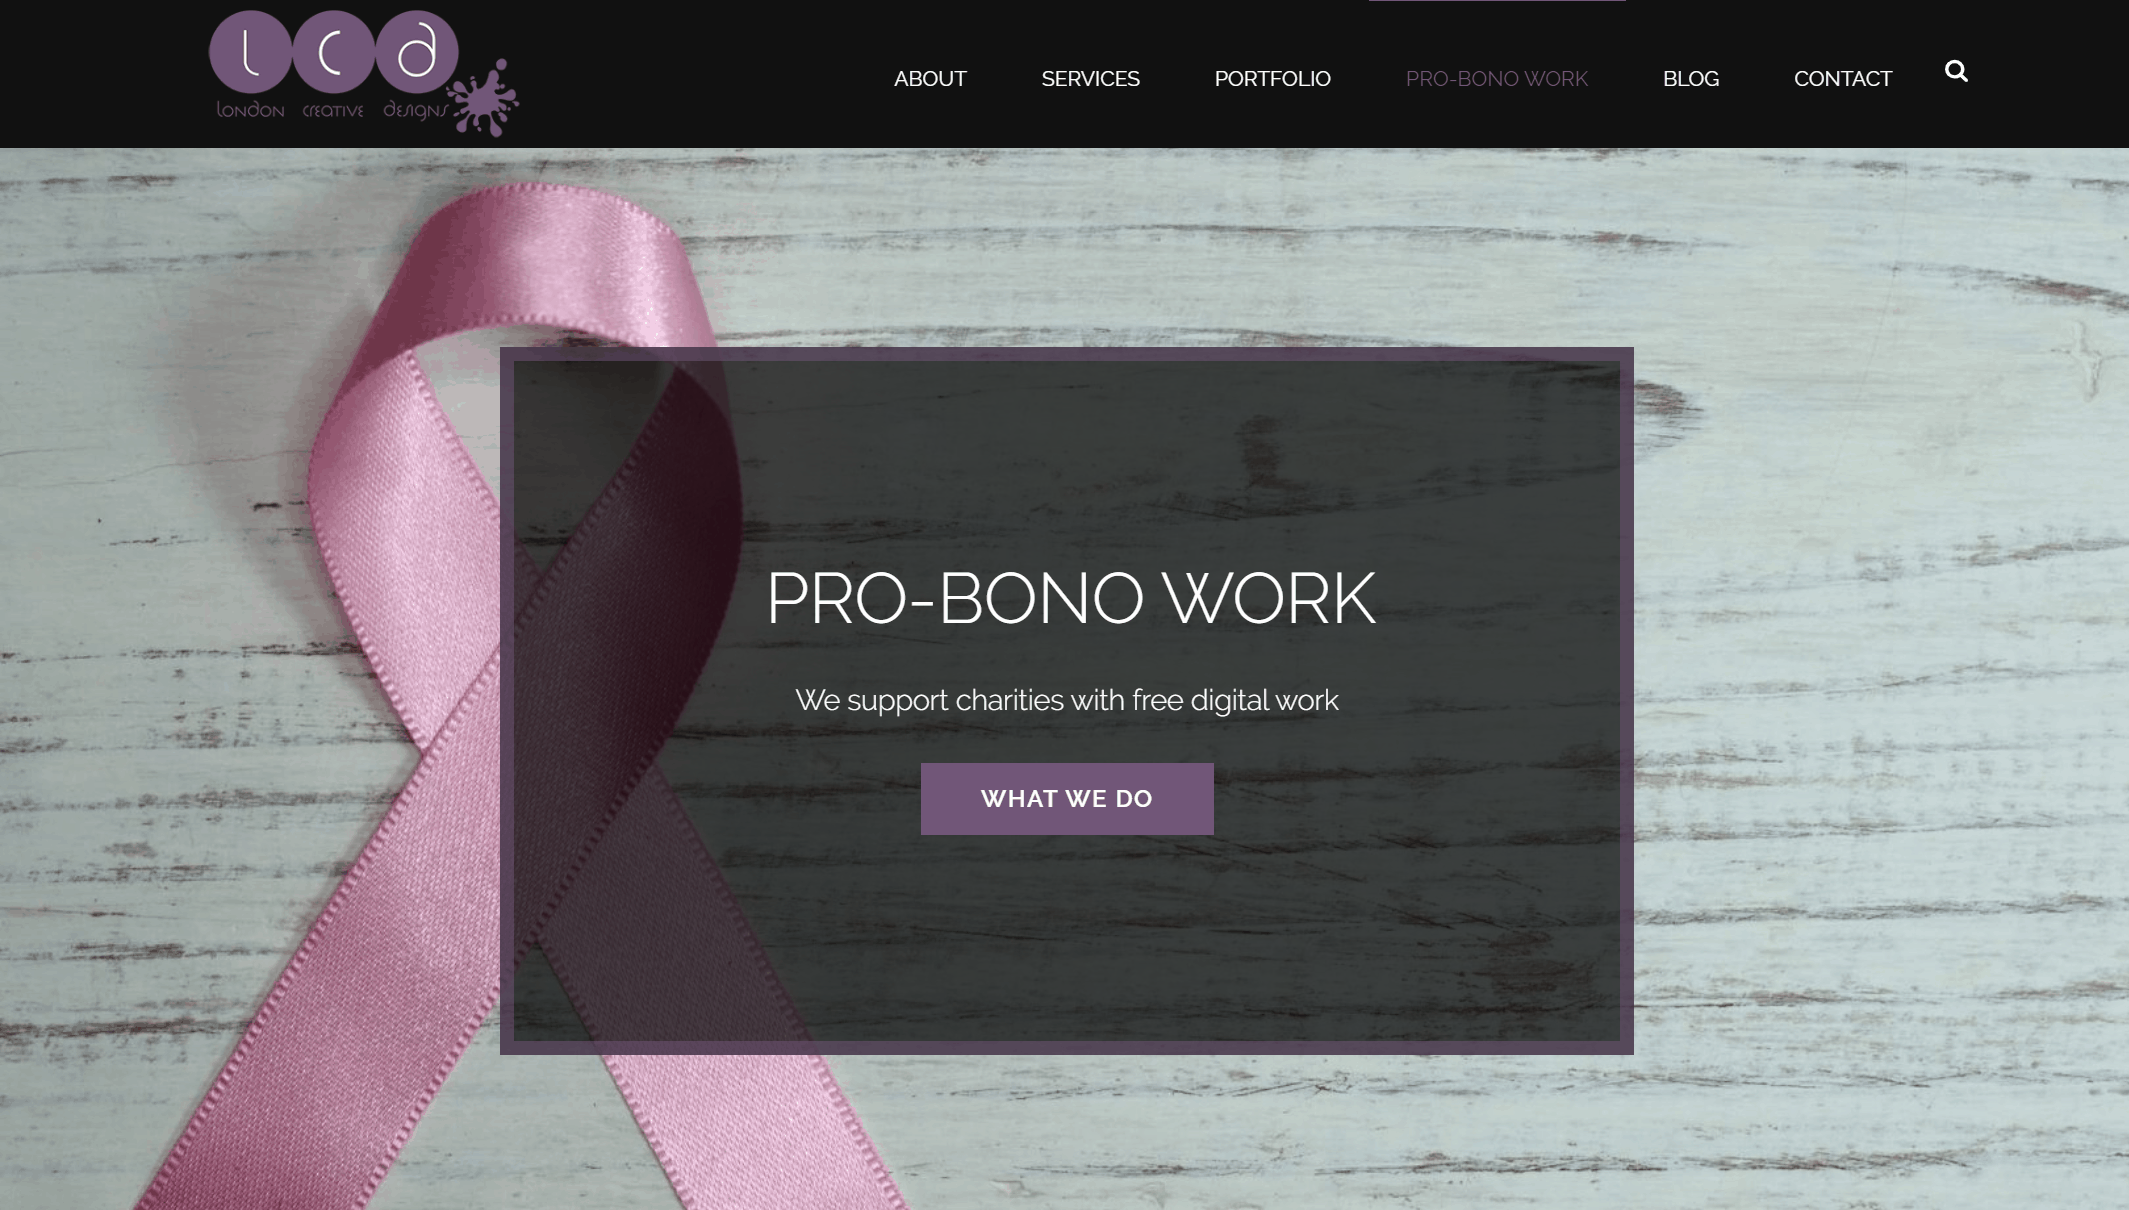 London creative designs pro bono charity work page